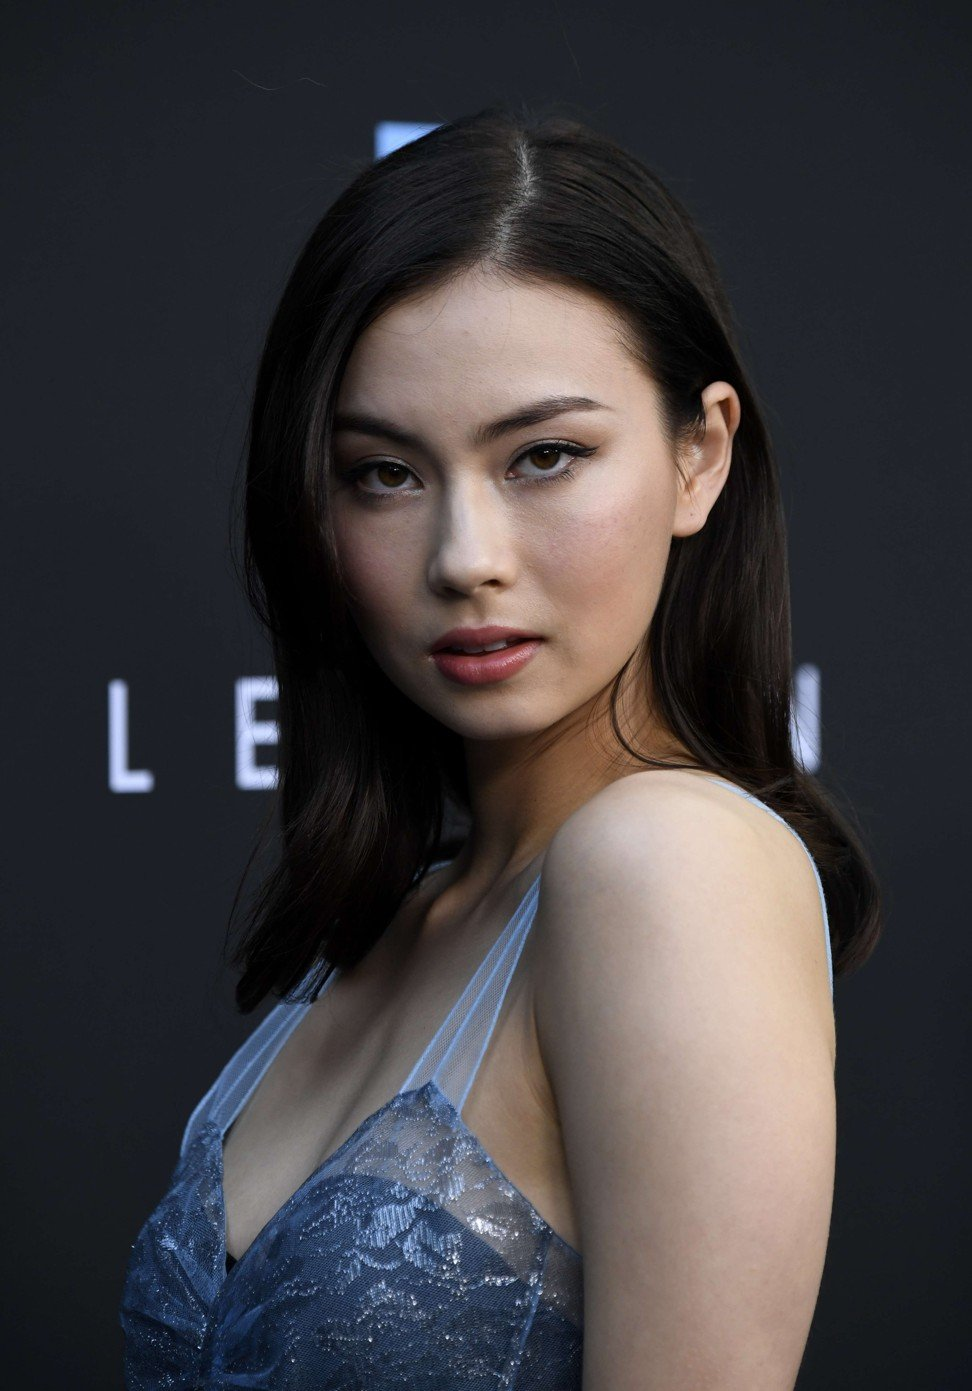 Meet Lauren Tsai, Terrace House star in Legion season 3 making her acting debut